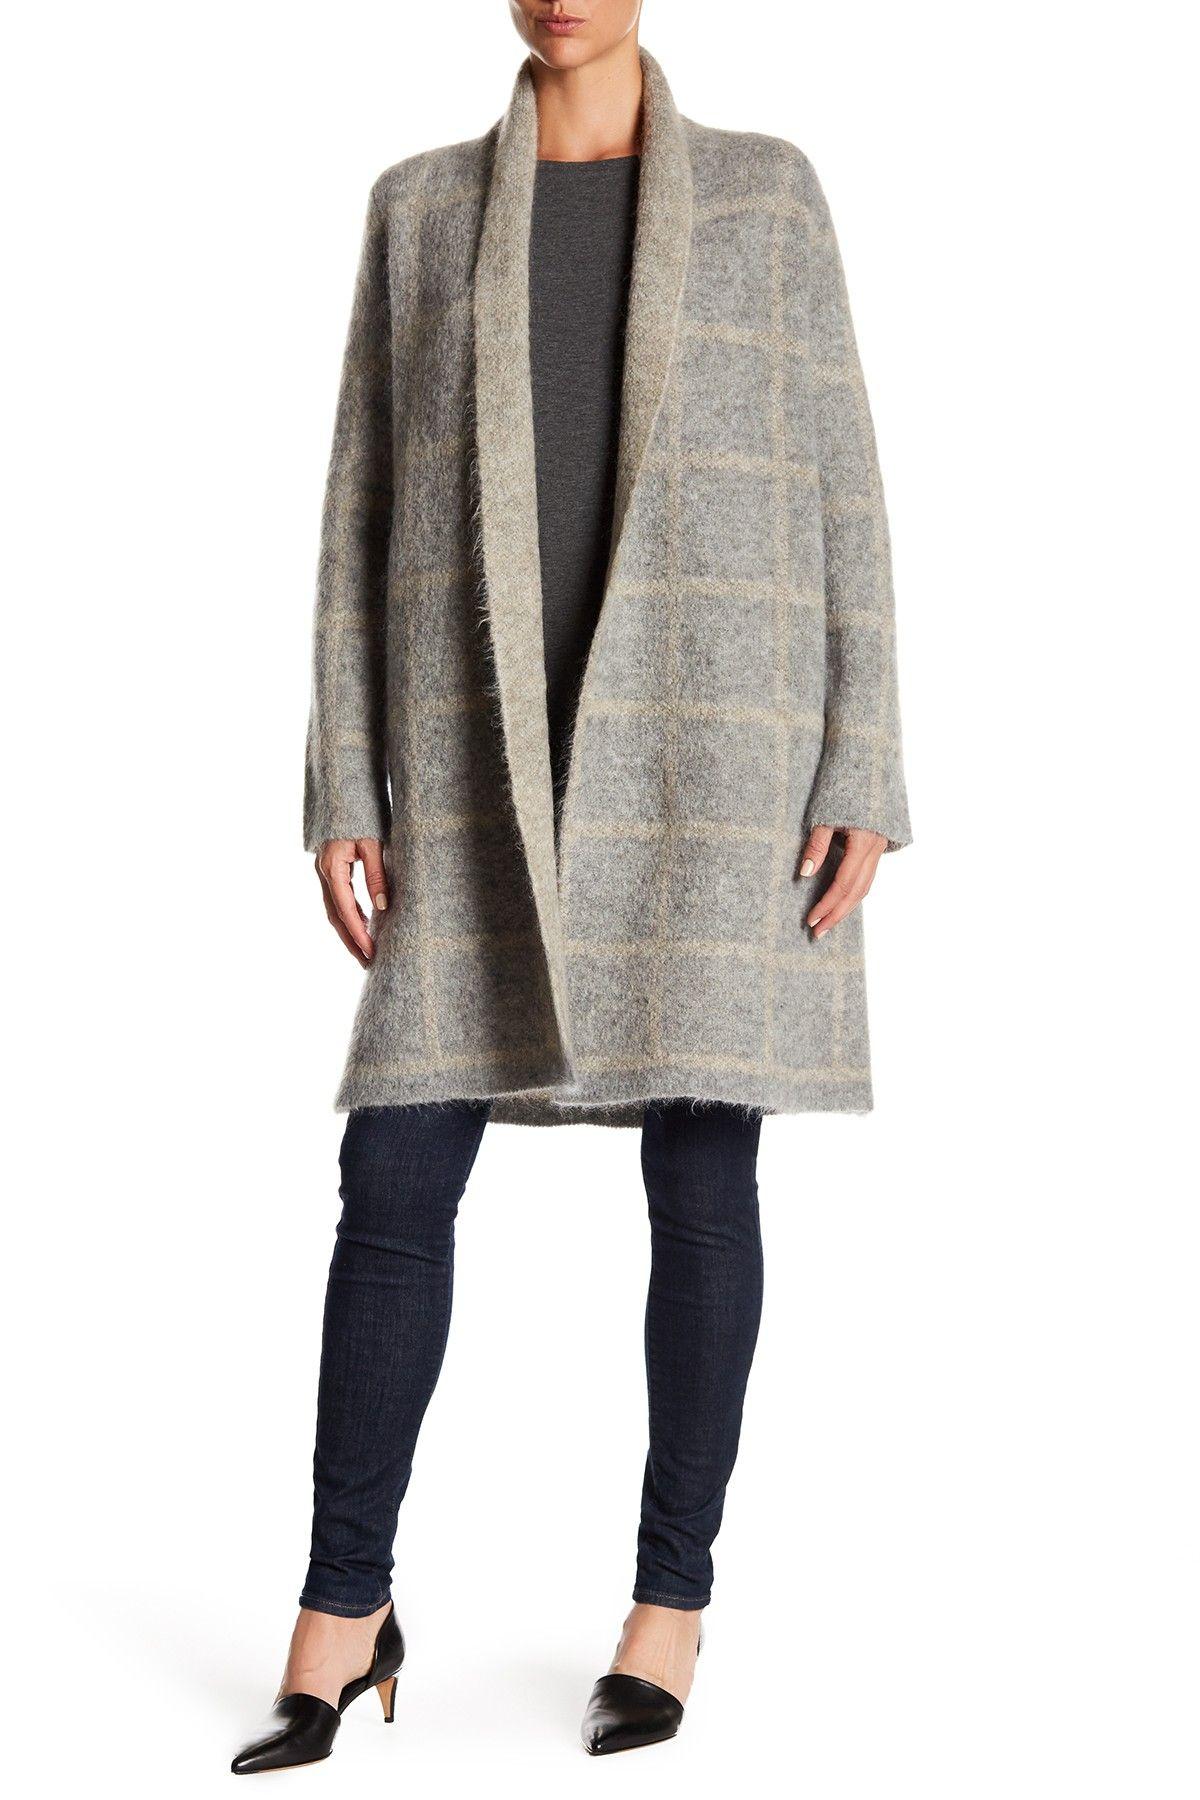 rack style fisher images fall neck pinterest hautelook best autumn nordstrom eileen on tunic v cashmere knit